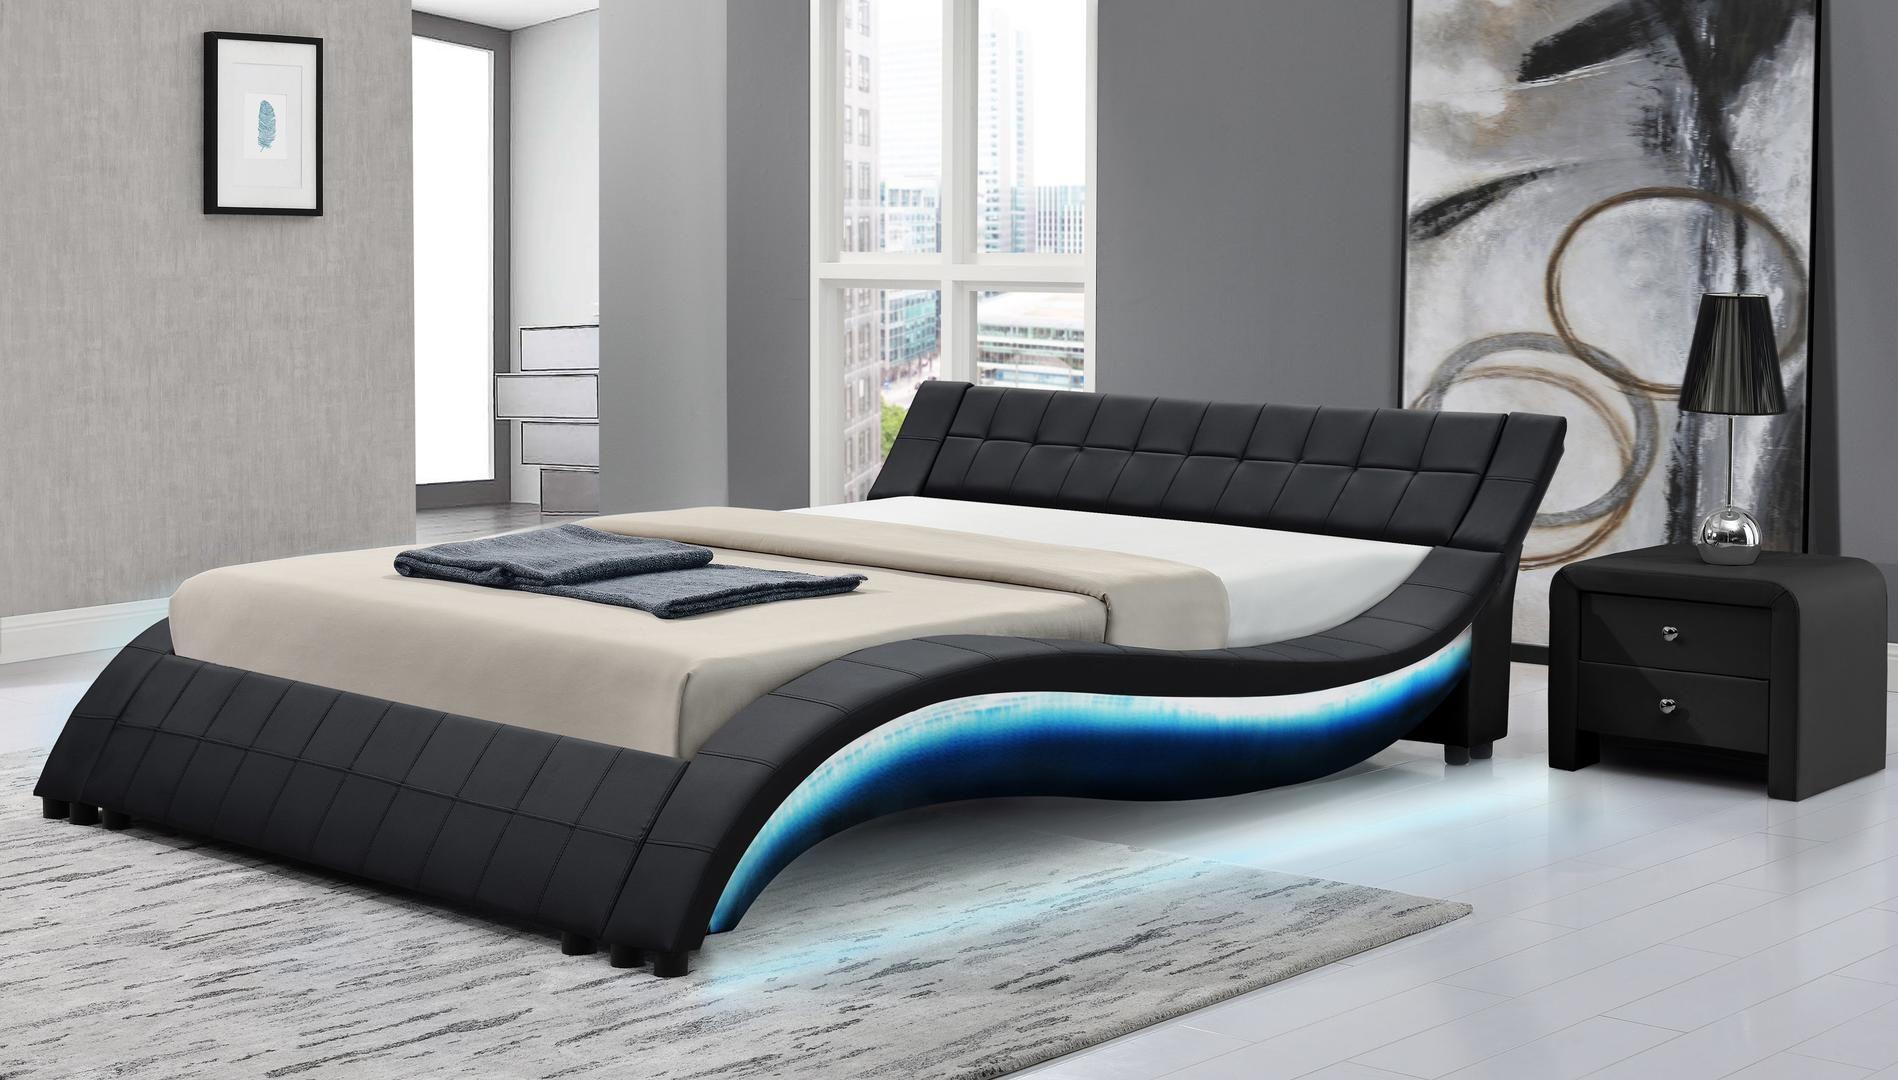 Milo Italia Aurora Main Image Bed Design Modern Bedroom